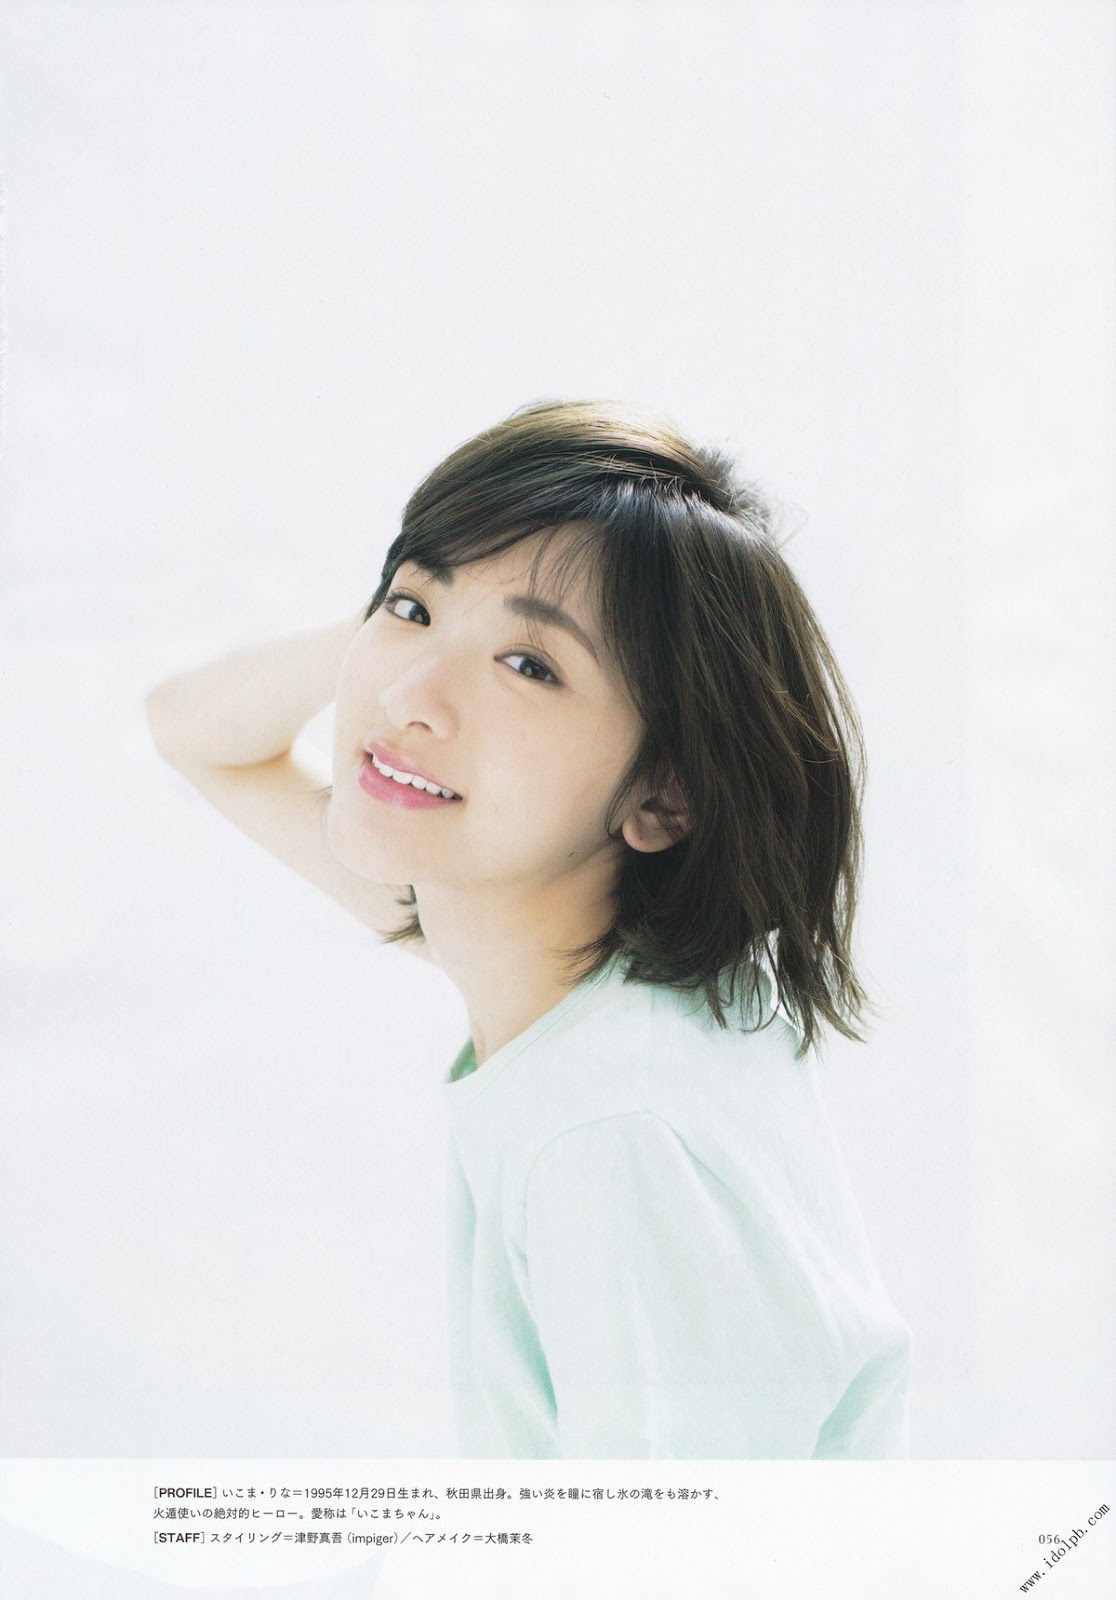 Ikoma Rina 生駒里奈 Nogizaka46, BRODY 2017.06 (ブロディ 2017年06月号)